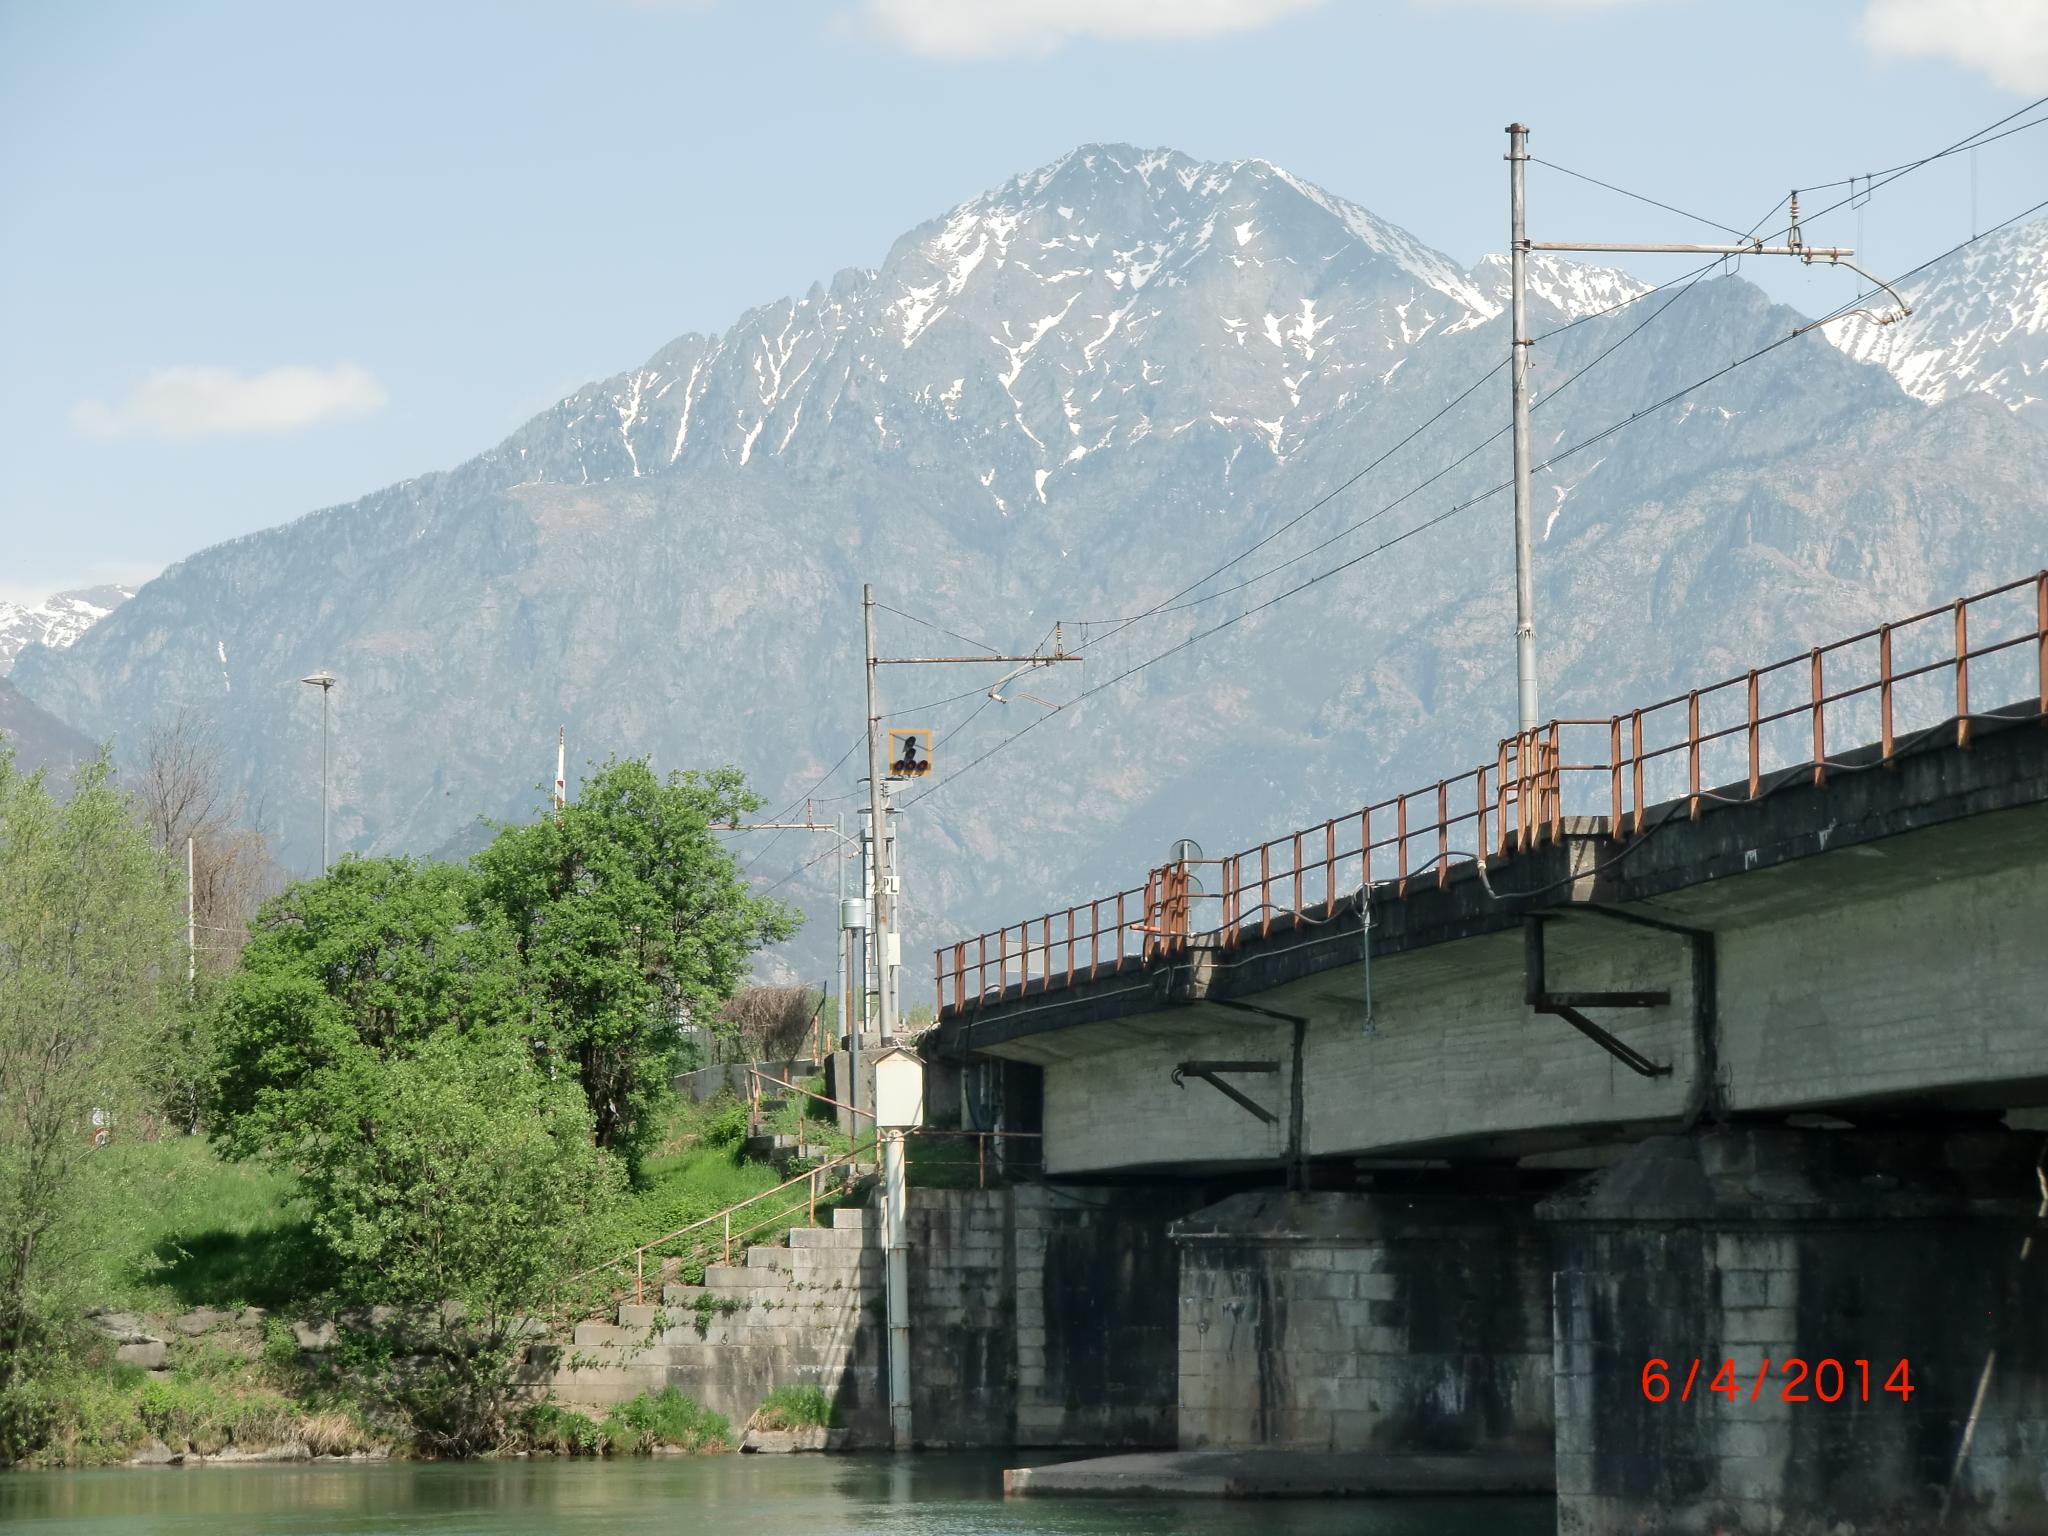 Valtellina, Valchiavenna, Orobie e Lario: MARZO 2017-cimg4462.jpg